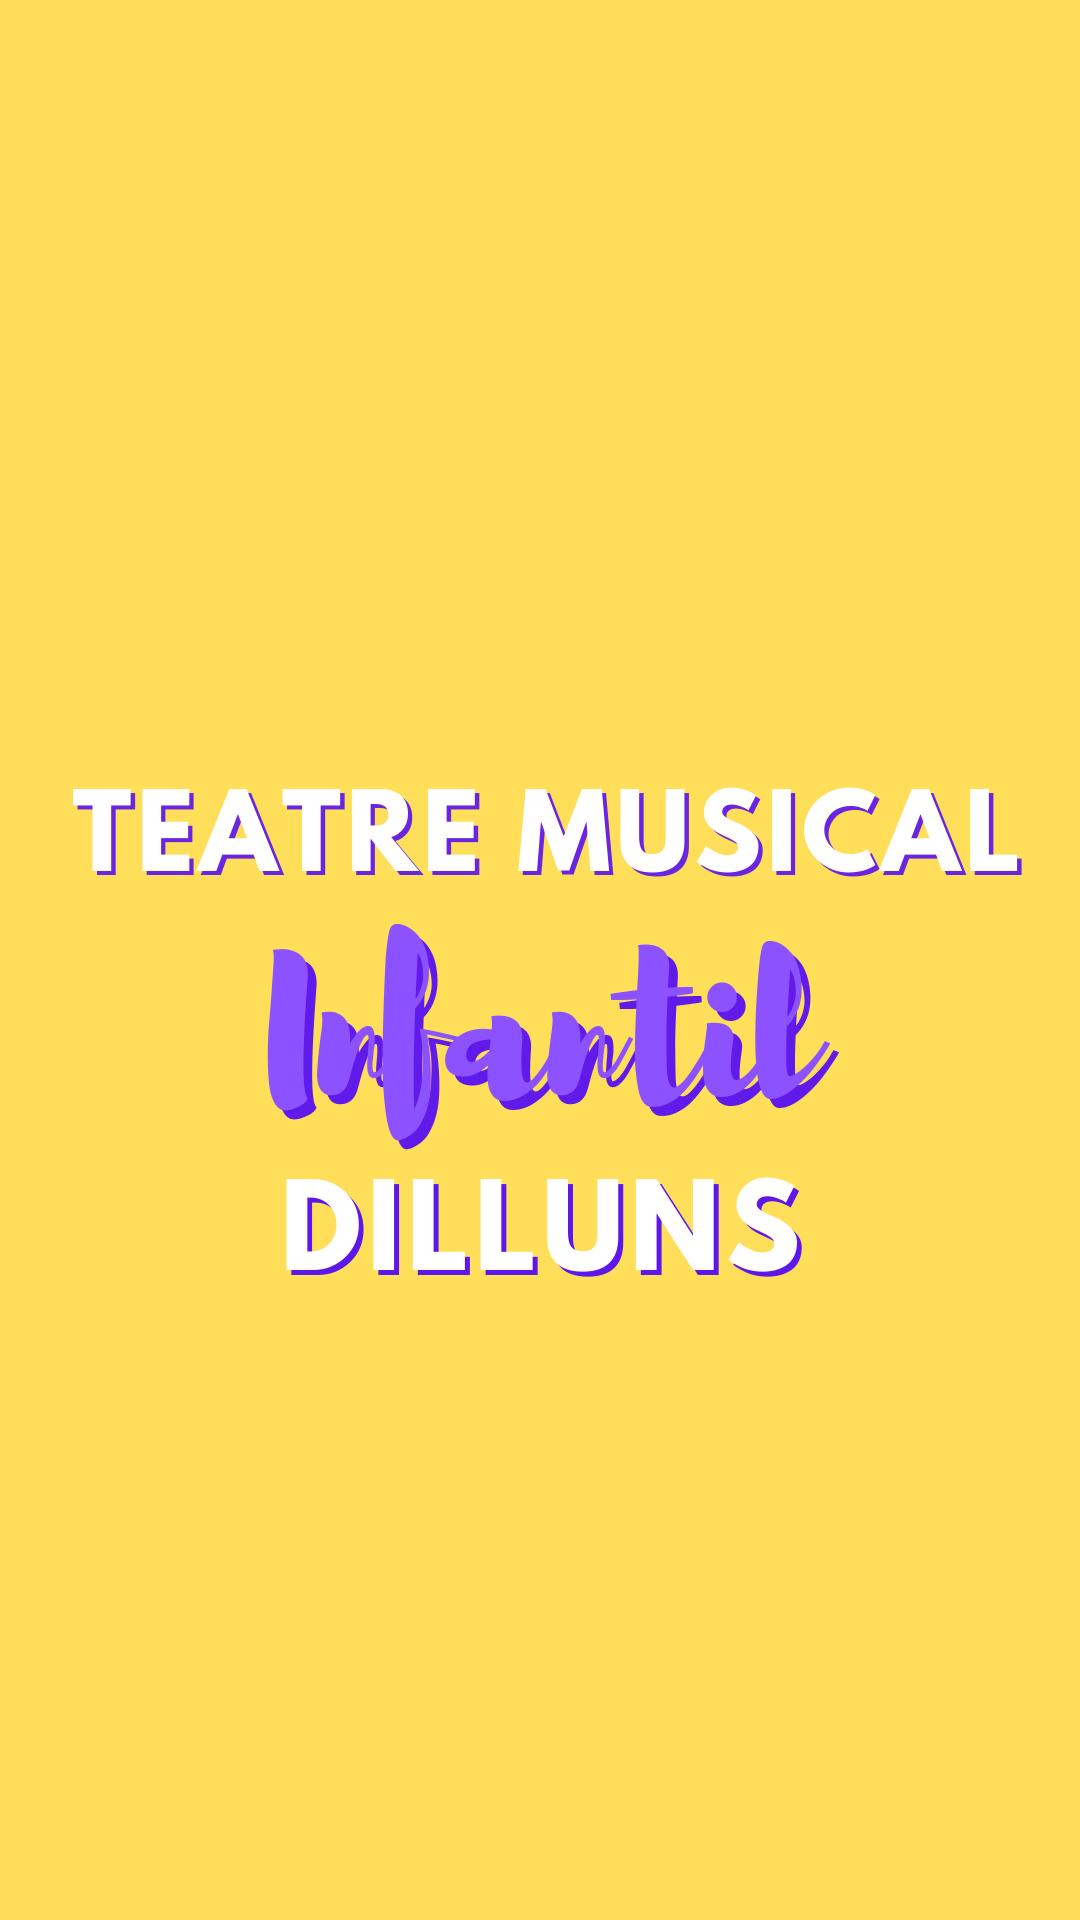 Teatre Musical Infantil  2 (dilluns)